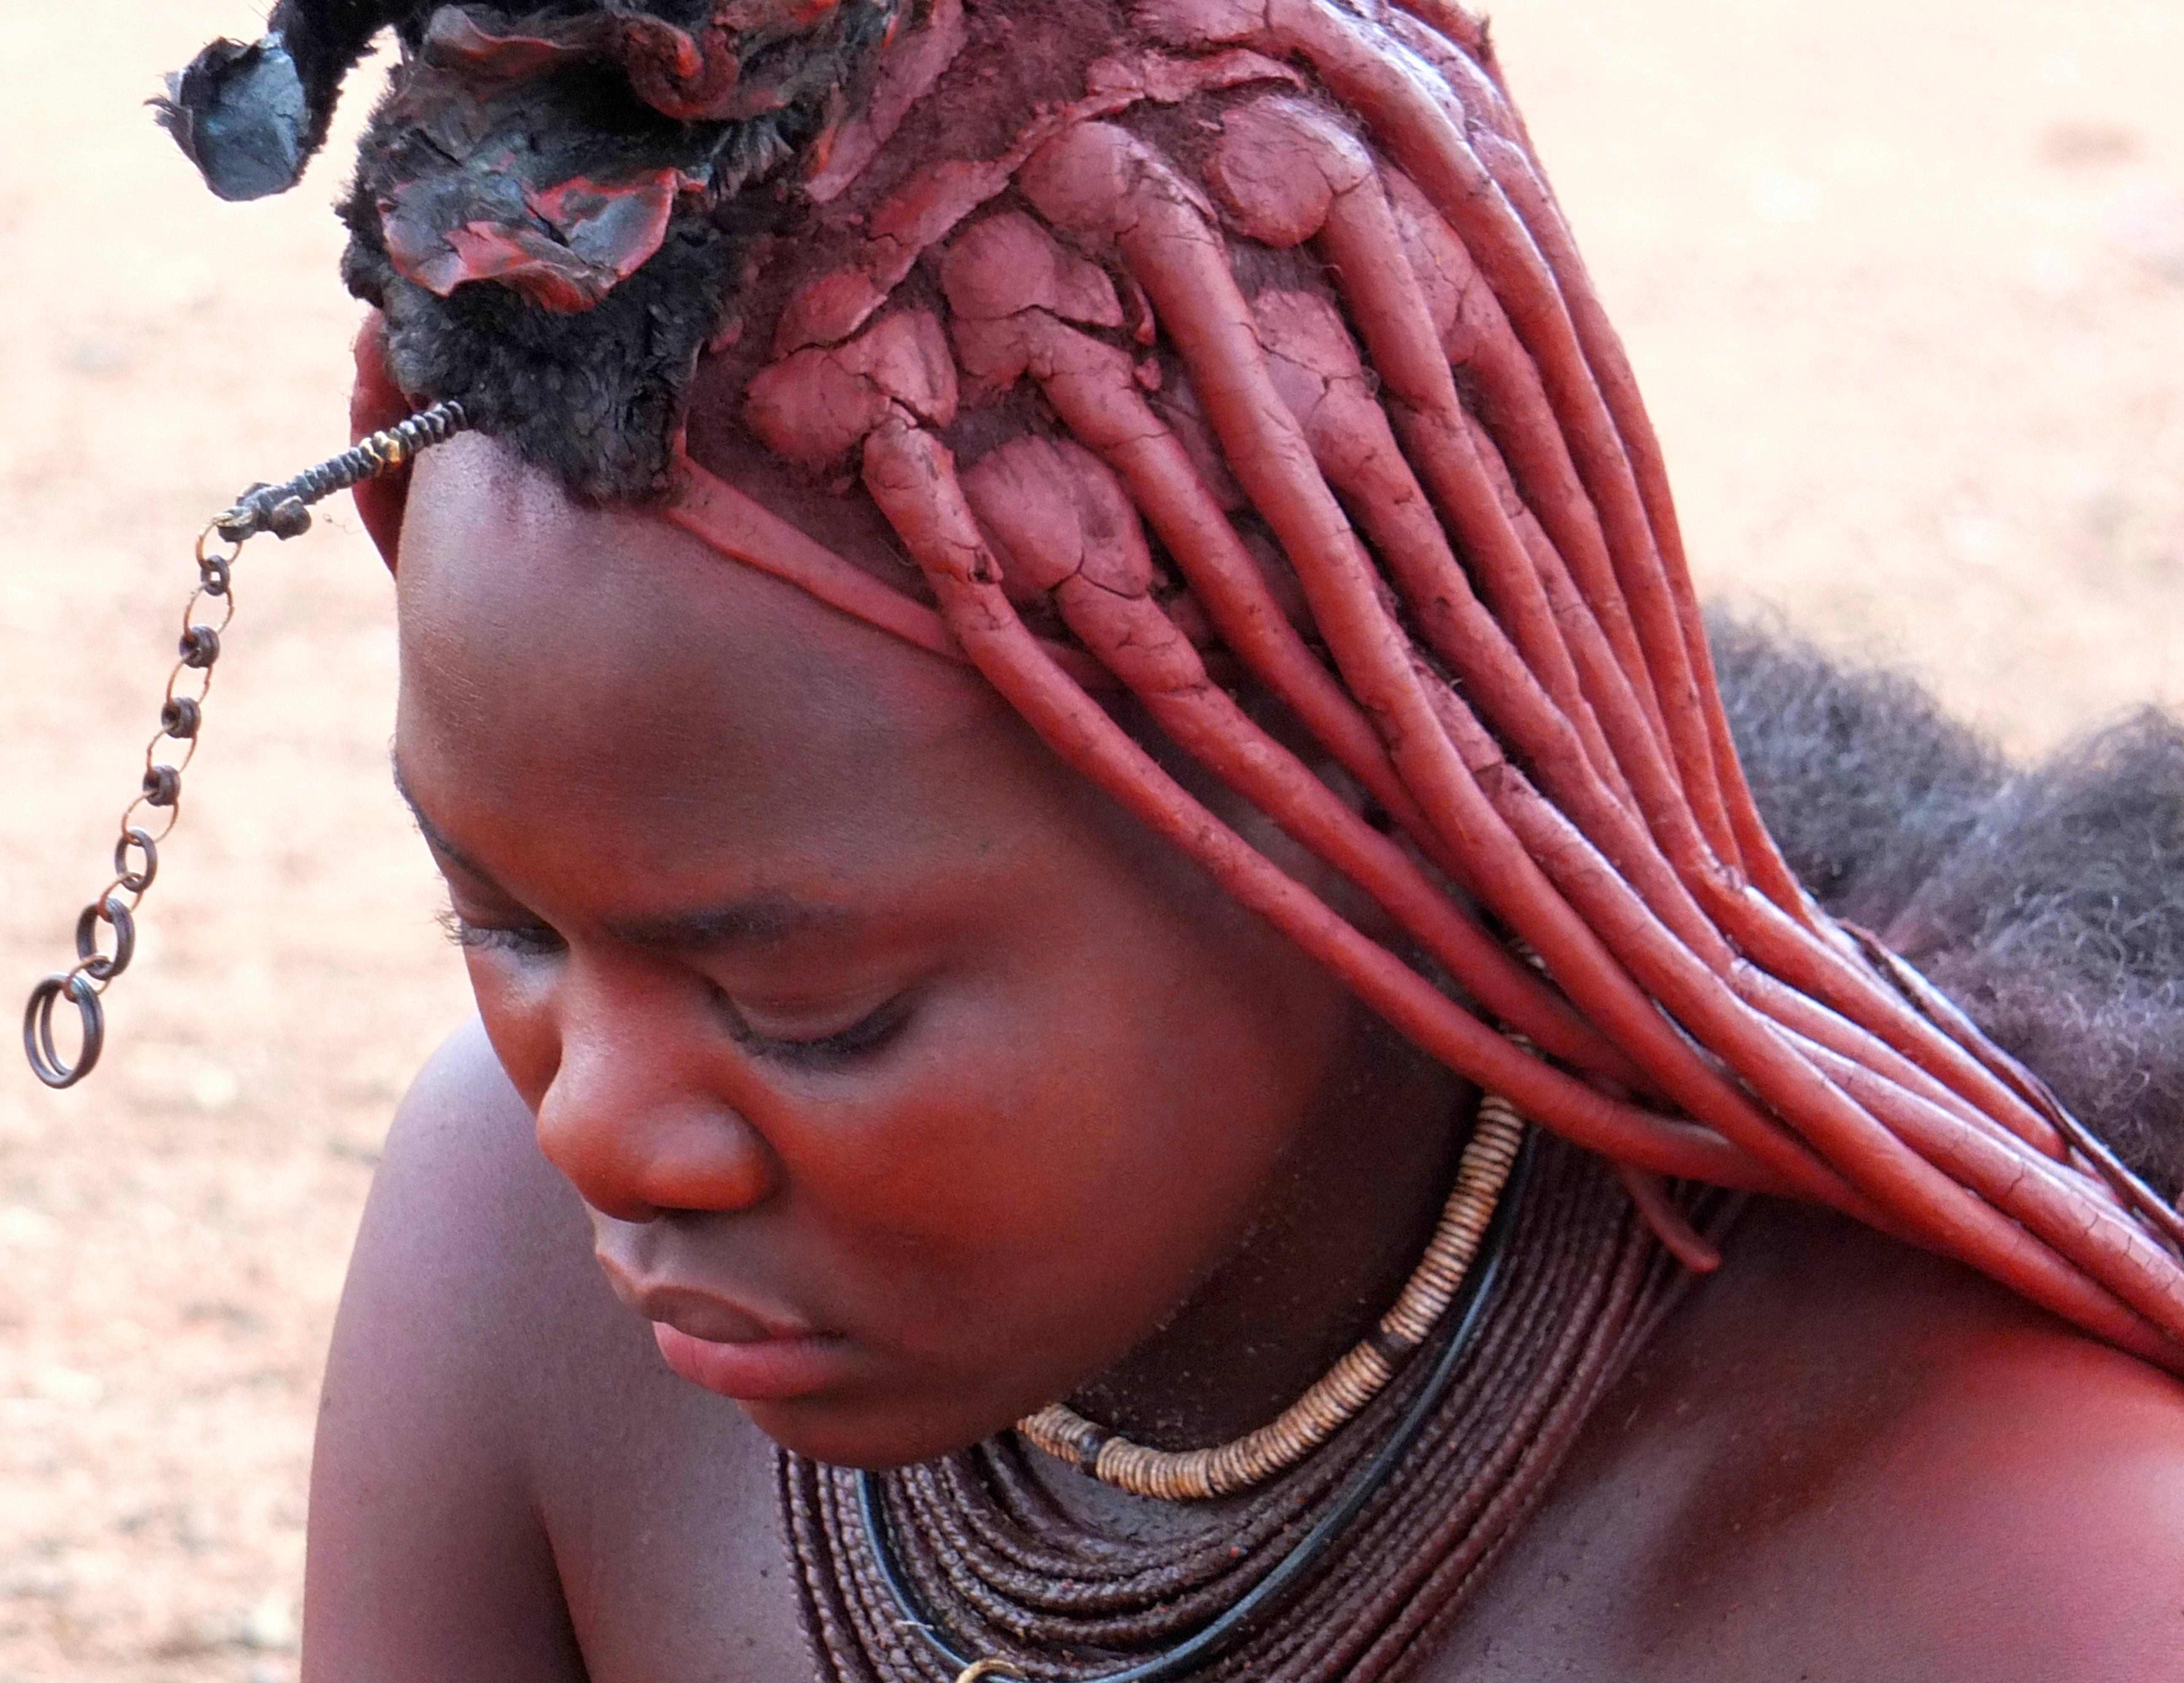 Naked namibian girls pics, classic sex pov